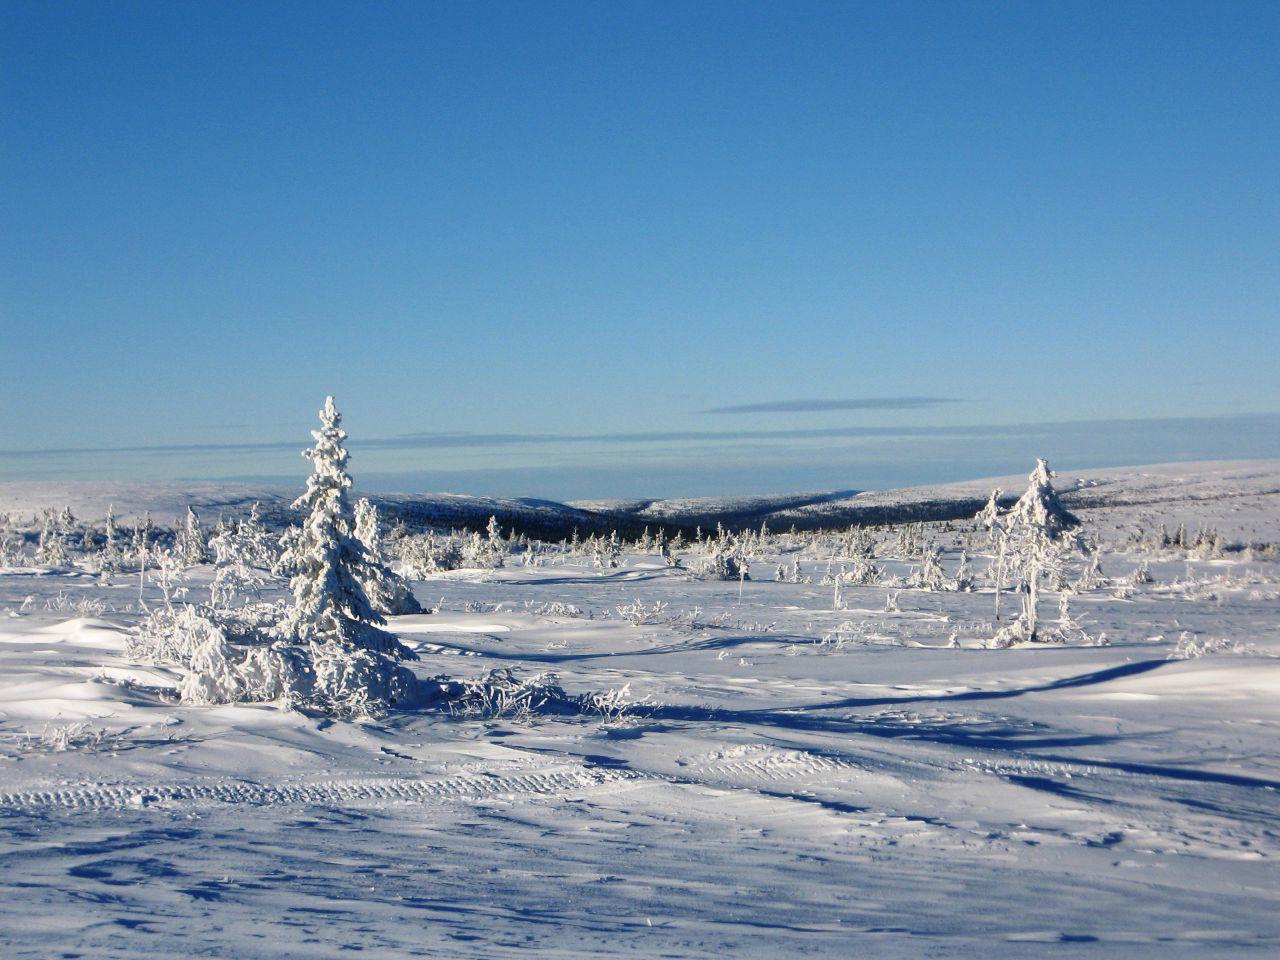 Im Skigebiet Sälen. Foto: Giåm (Guillaume Baviere) /flickr.com (CC BY 2.0)